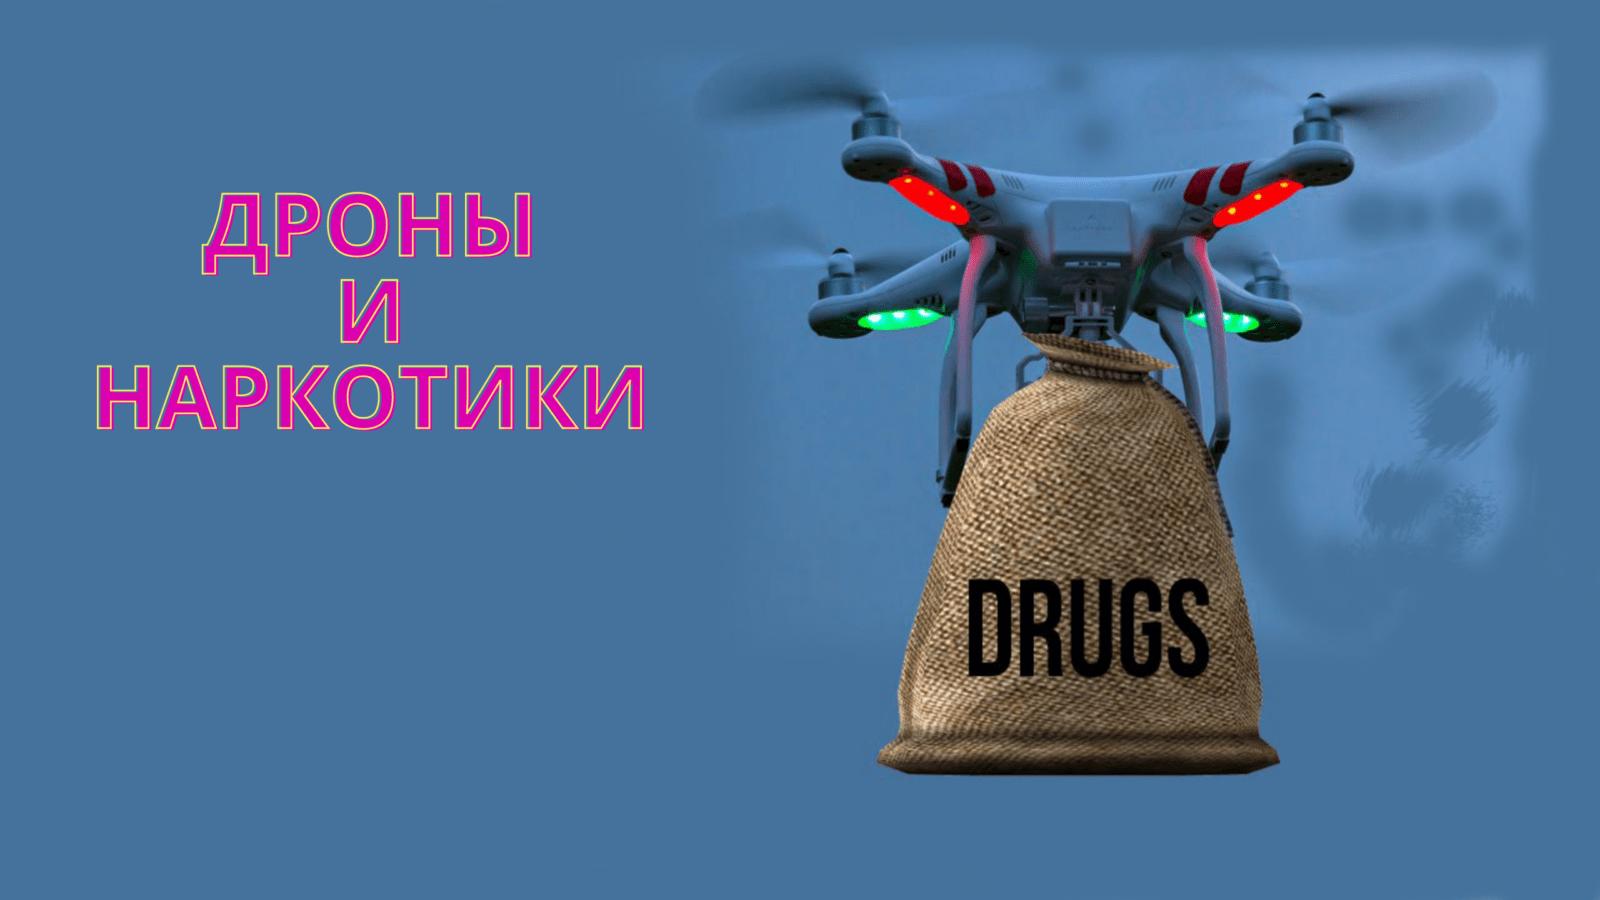 Дрон перевозил наркотики через границу Мексики в США.